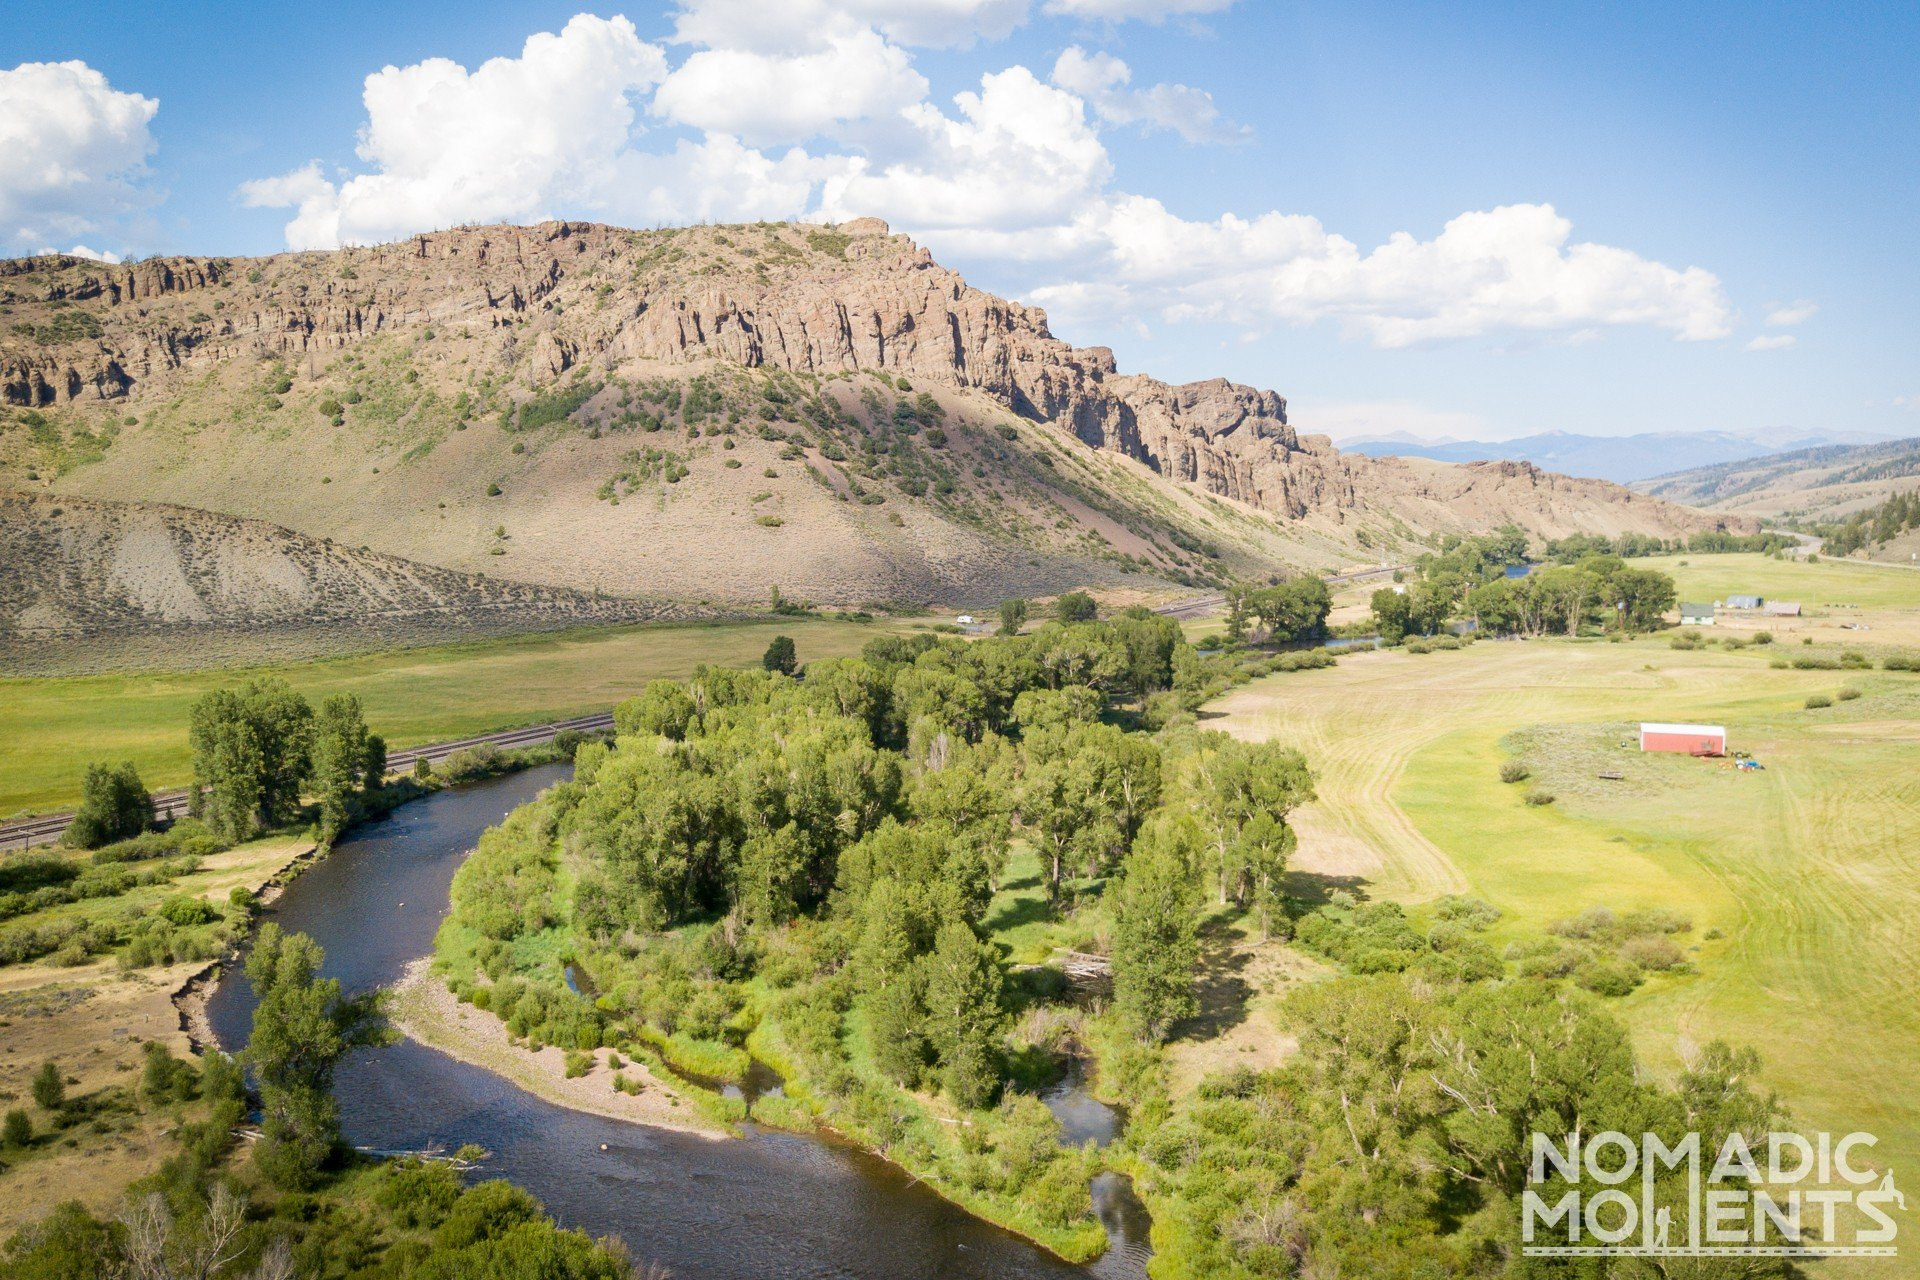 A drones view of the Colorado River